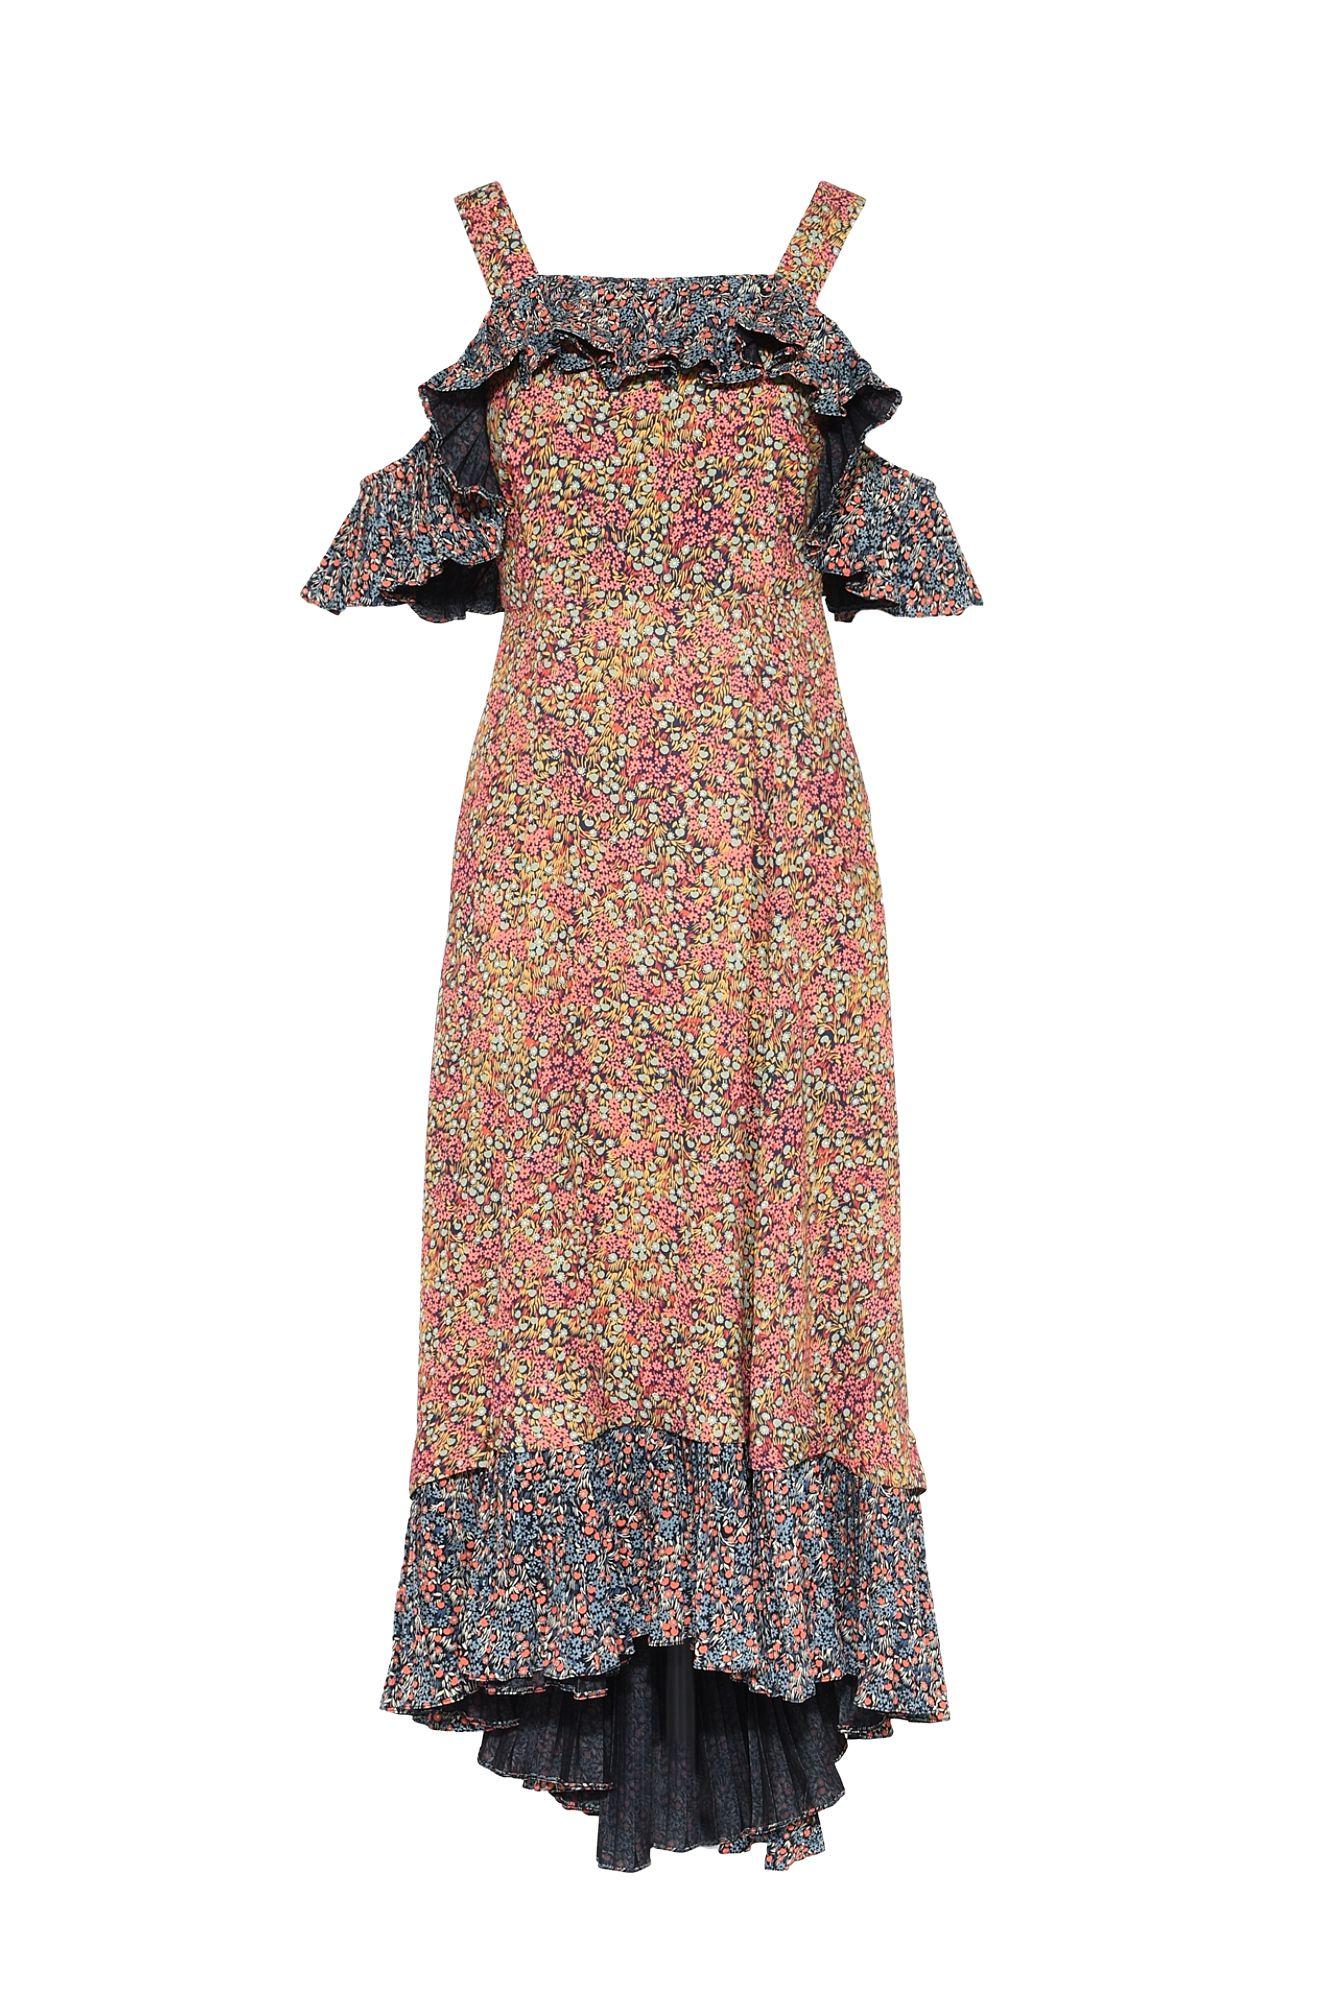 PAST-PRESENT DRESS